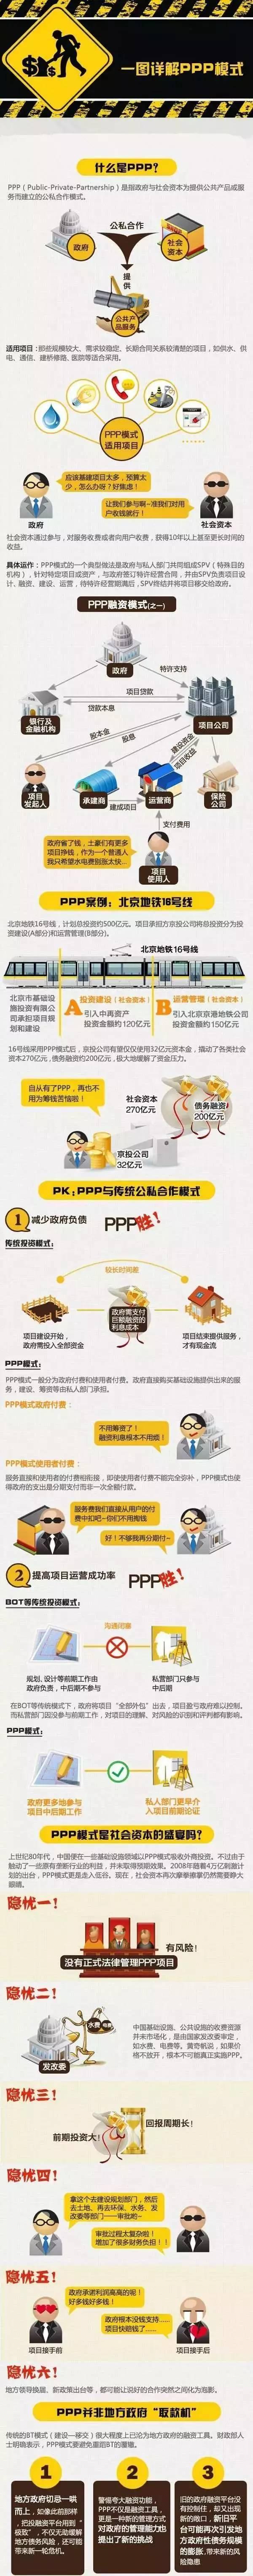 PPP模式与PPP项目操作流程,建议收藏!